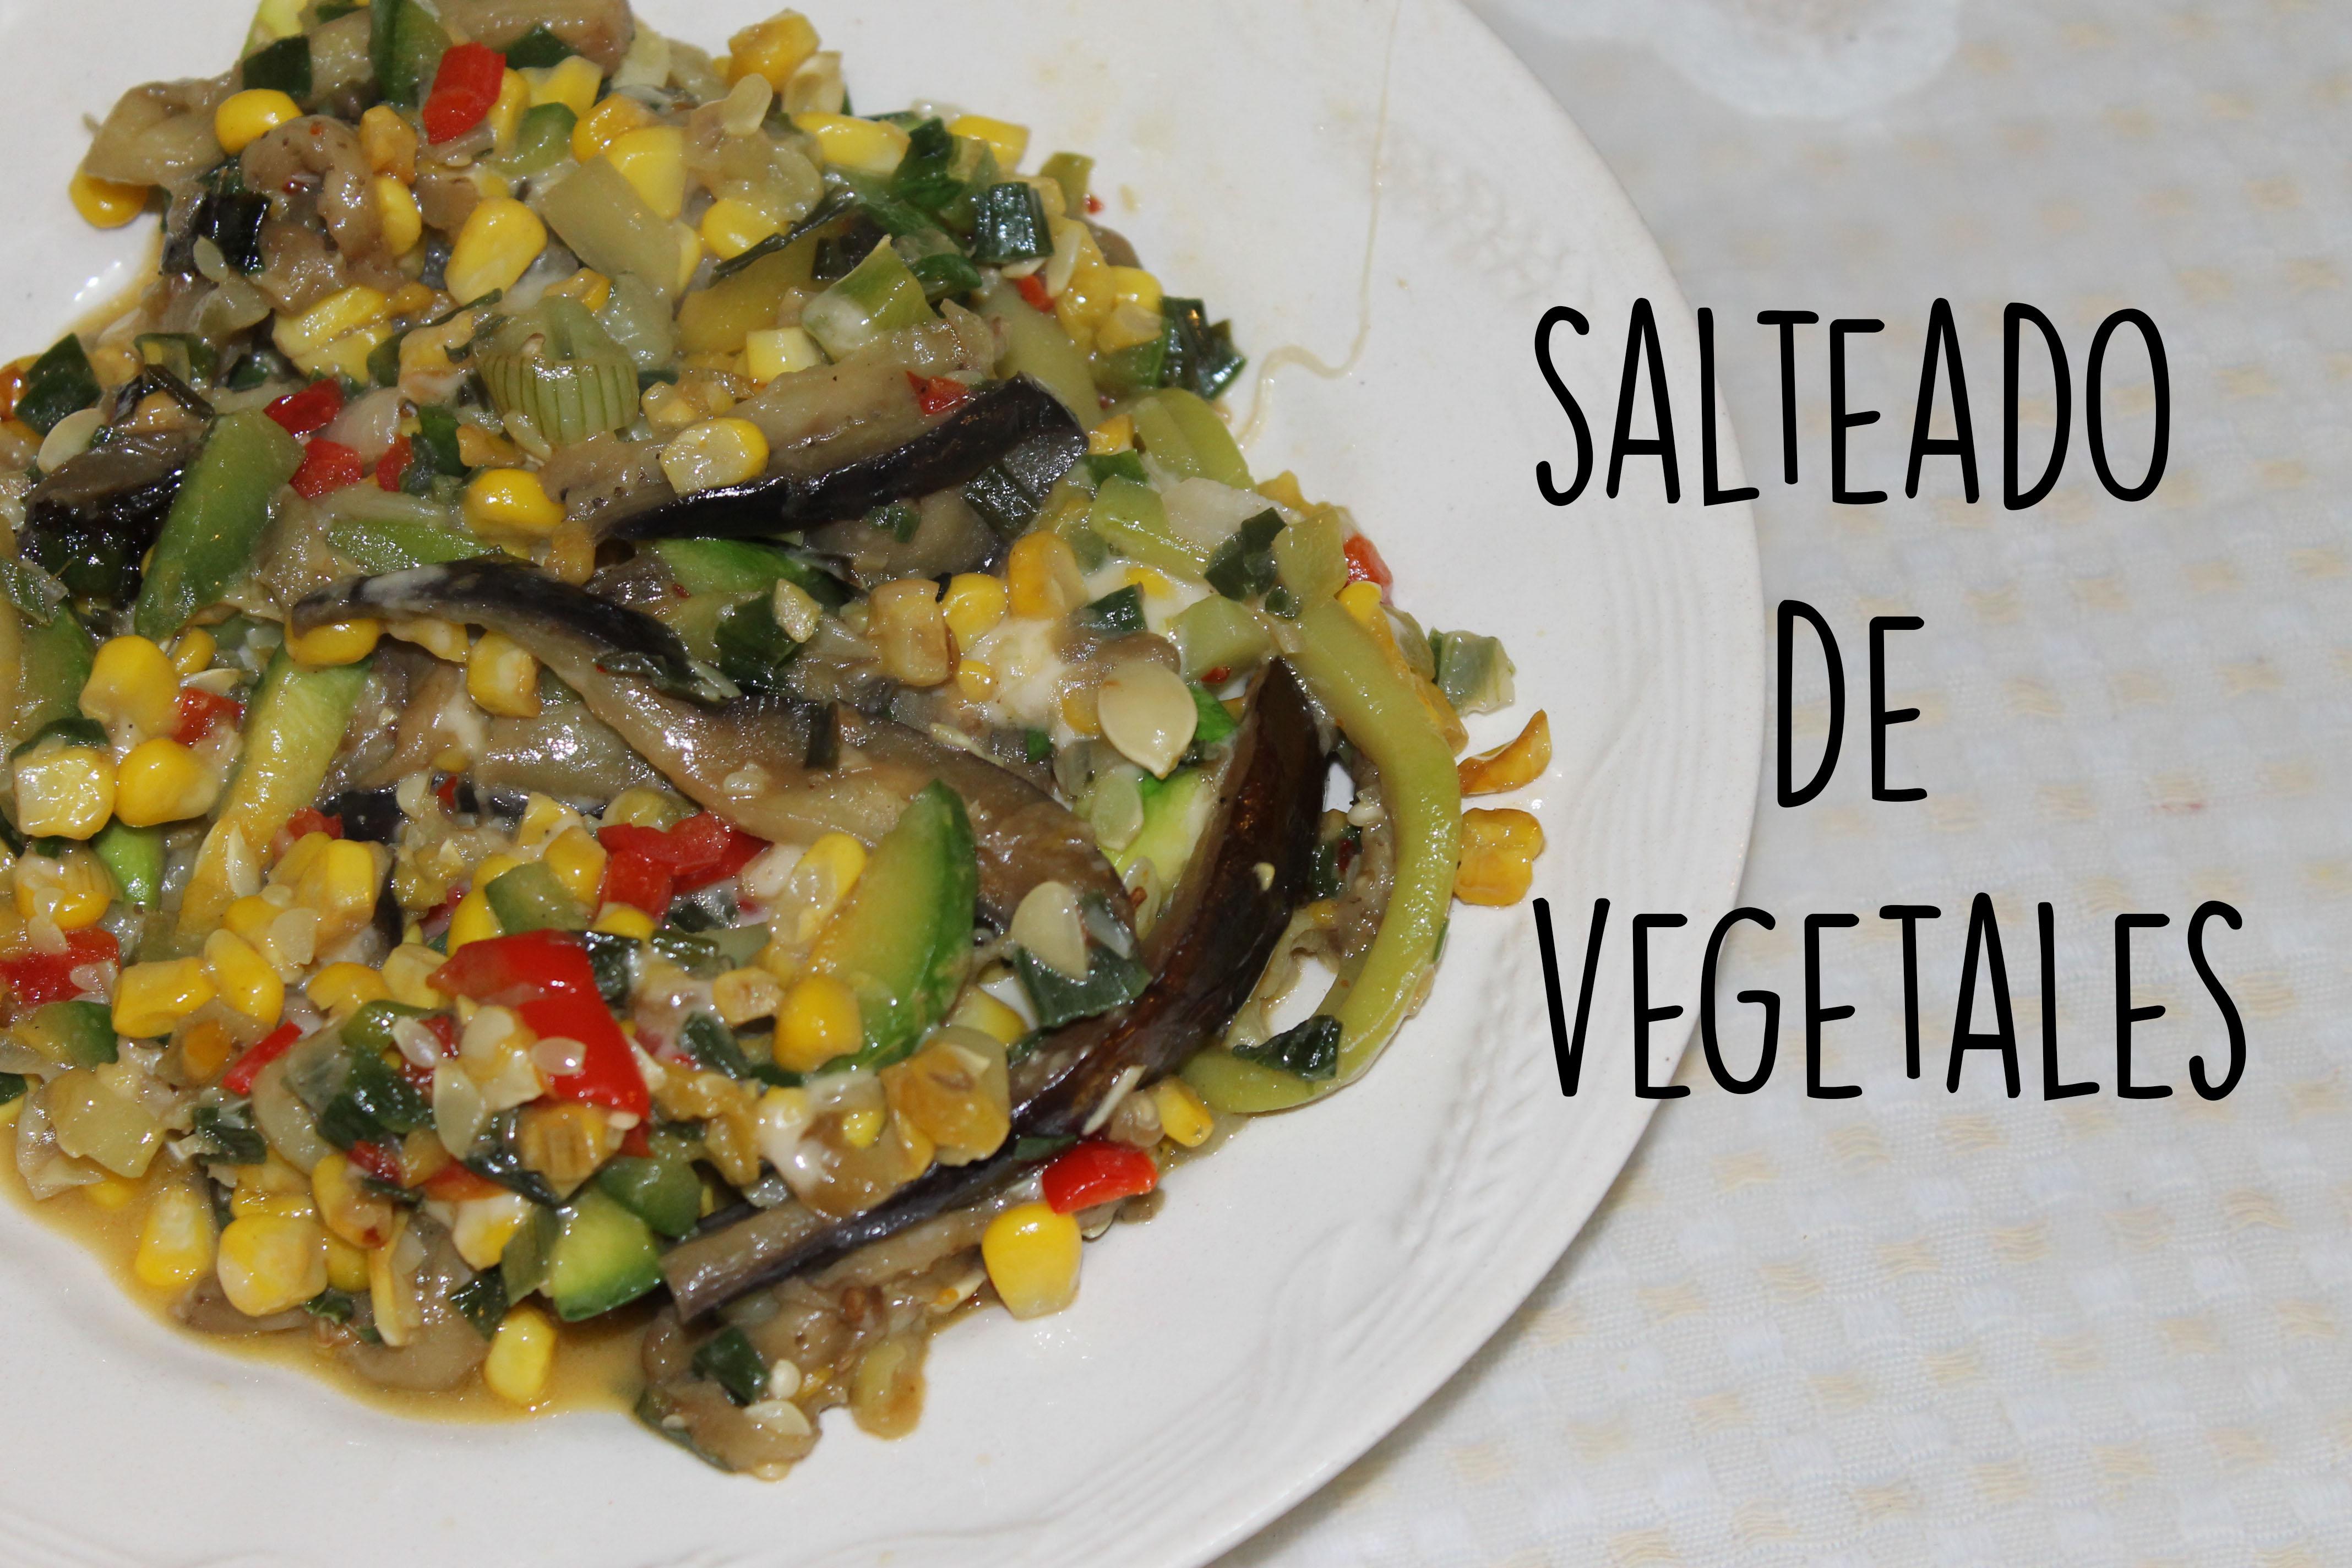 Salteado de vegetales receta paso a paso